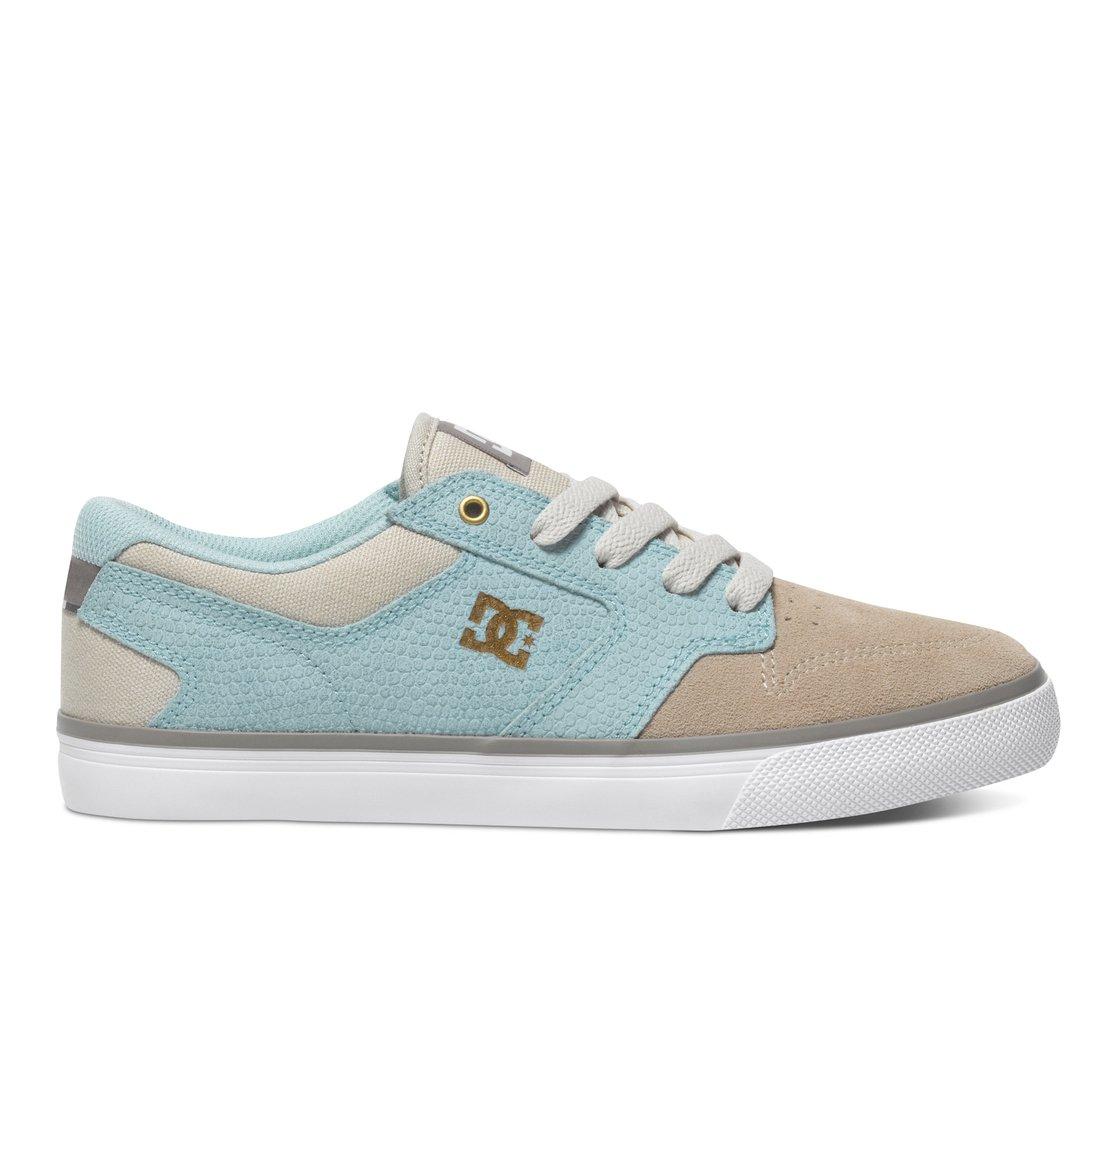 Argosy Vulc - Low-Top Shoes от DC Shoes